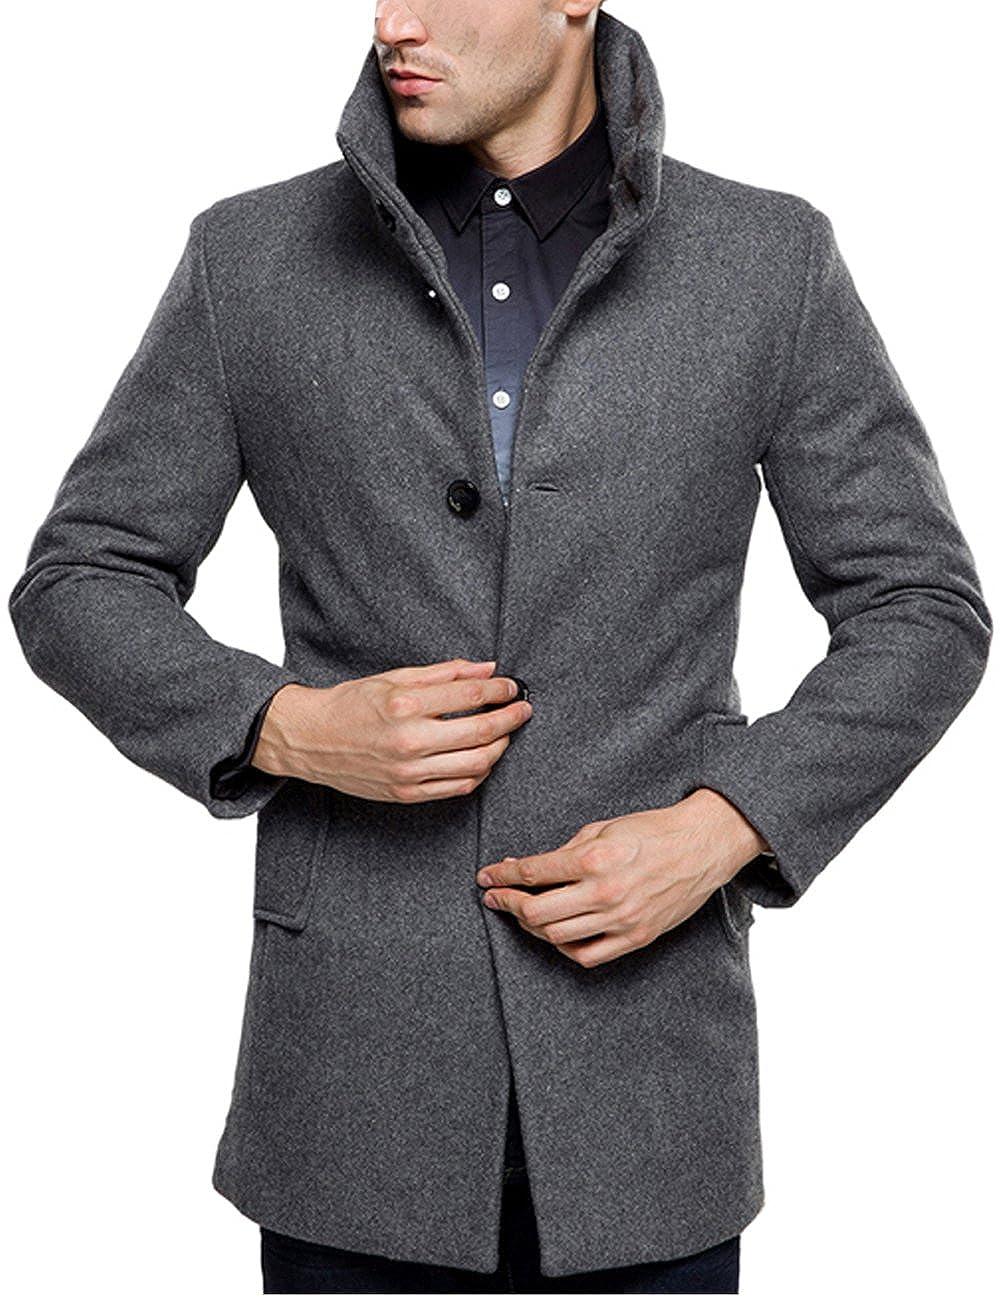 SSLR Abrigo Hombre de Lana Botonadura Singular Slim British Style Coat